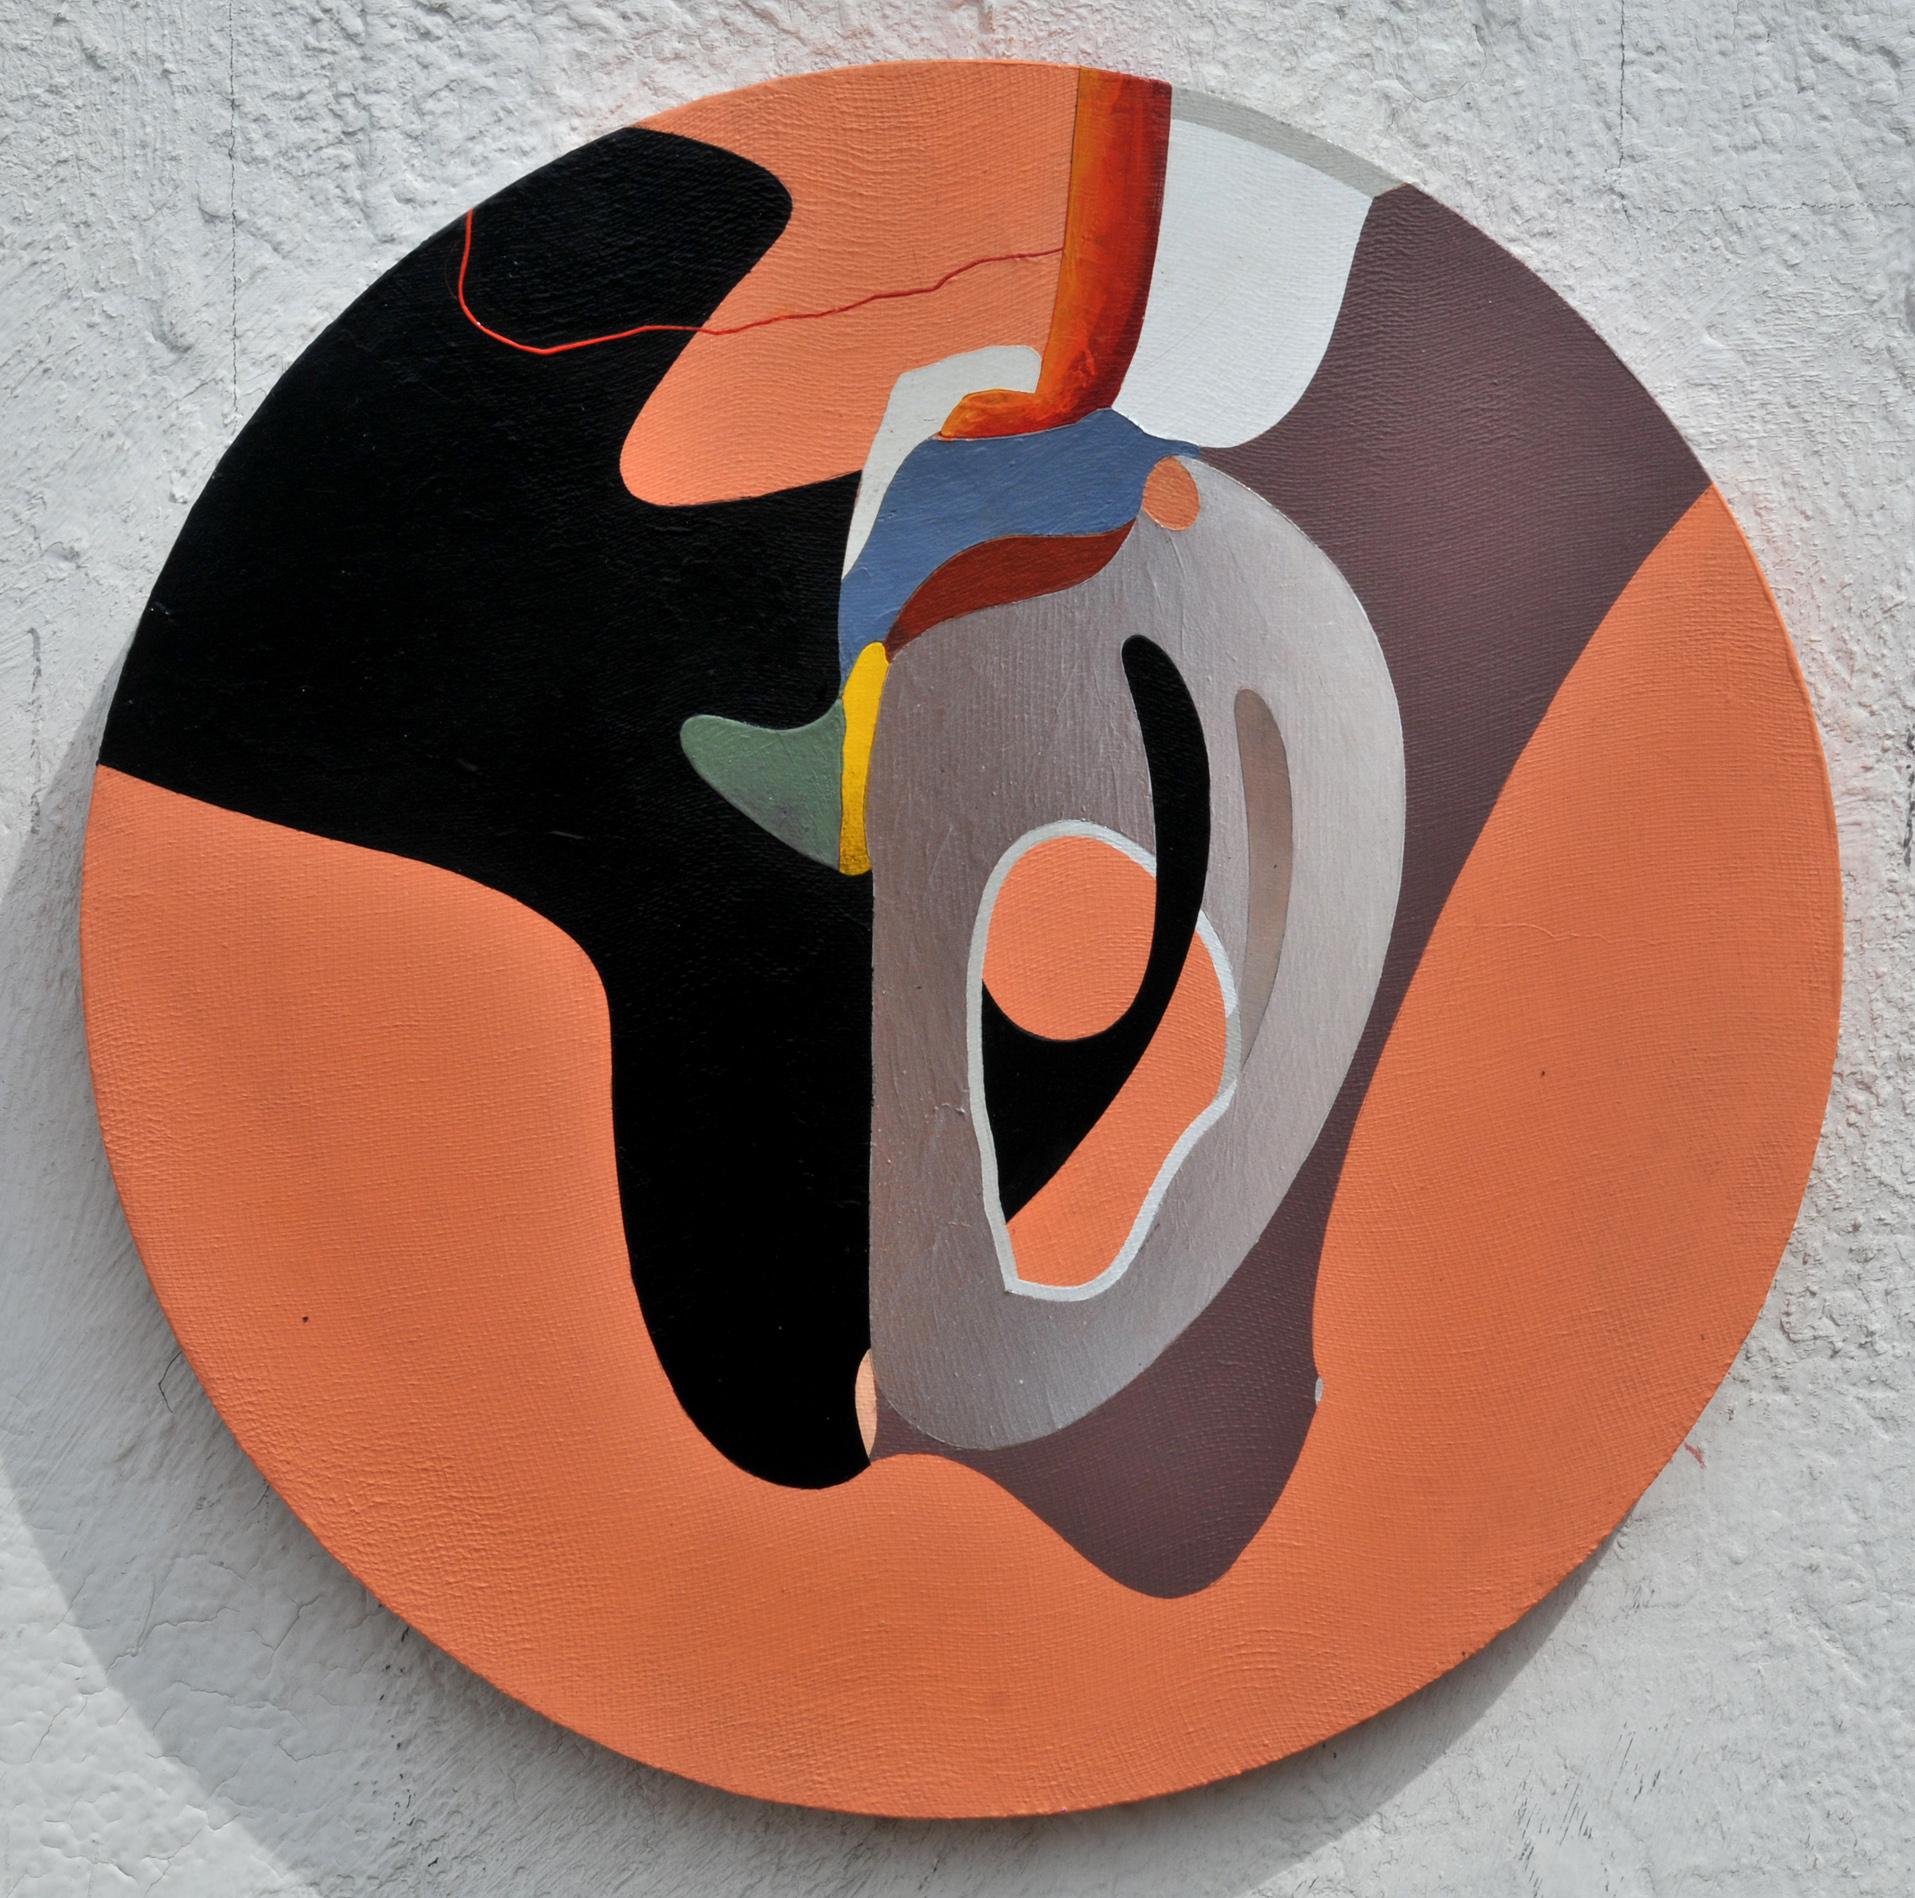 Abstract, acrylic on wood, D 43cm, 2019